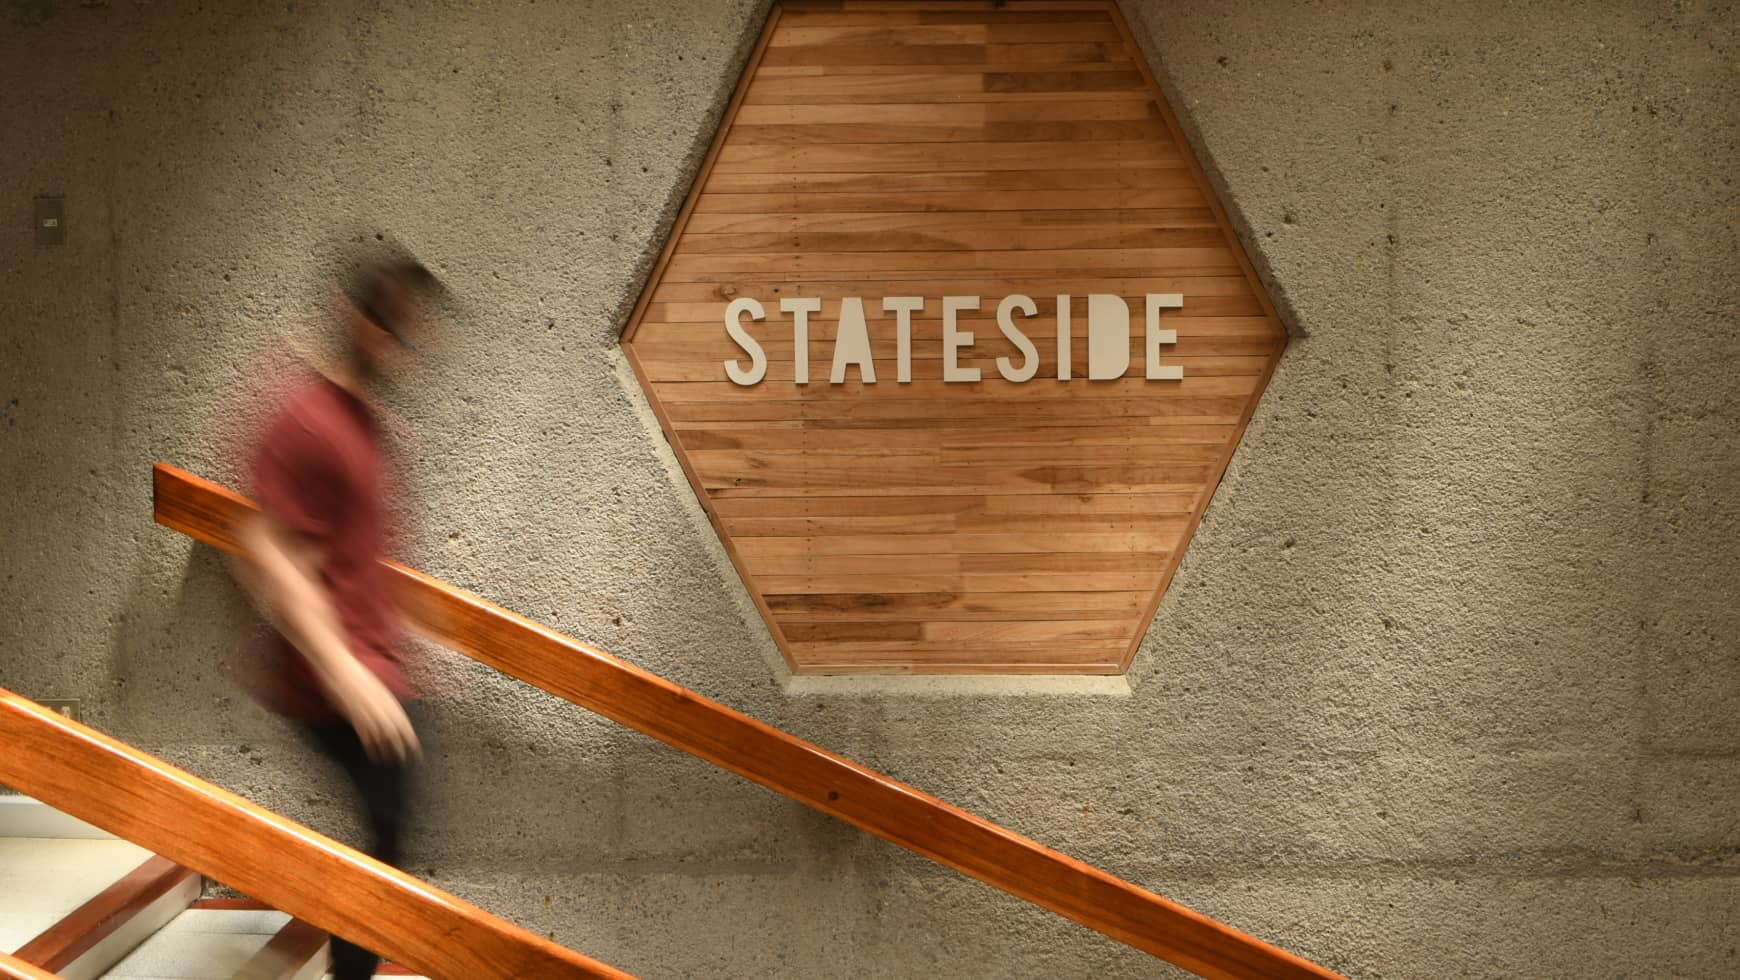 Stateside Office Image